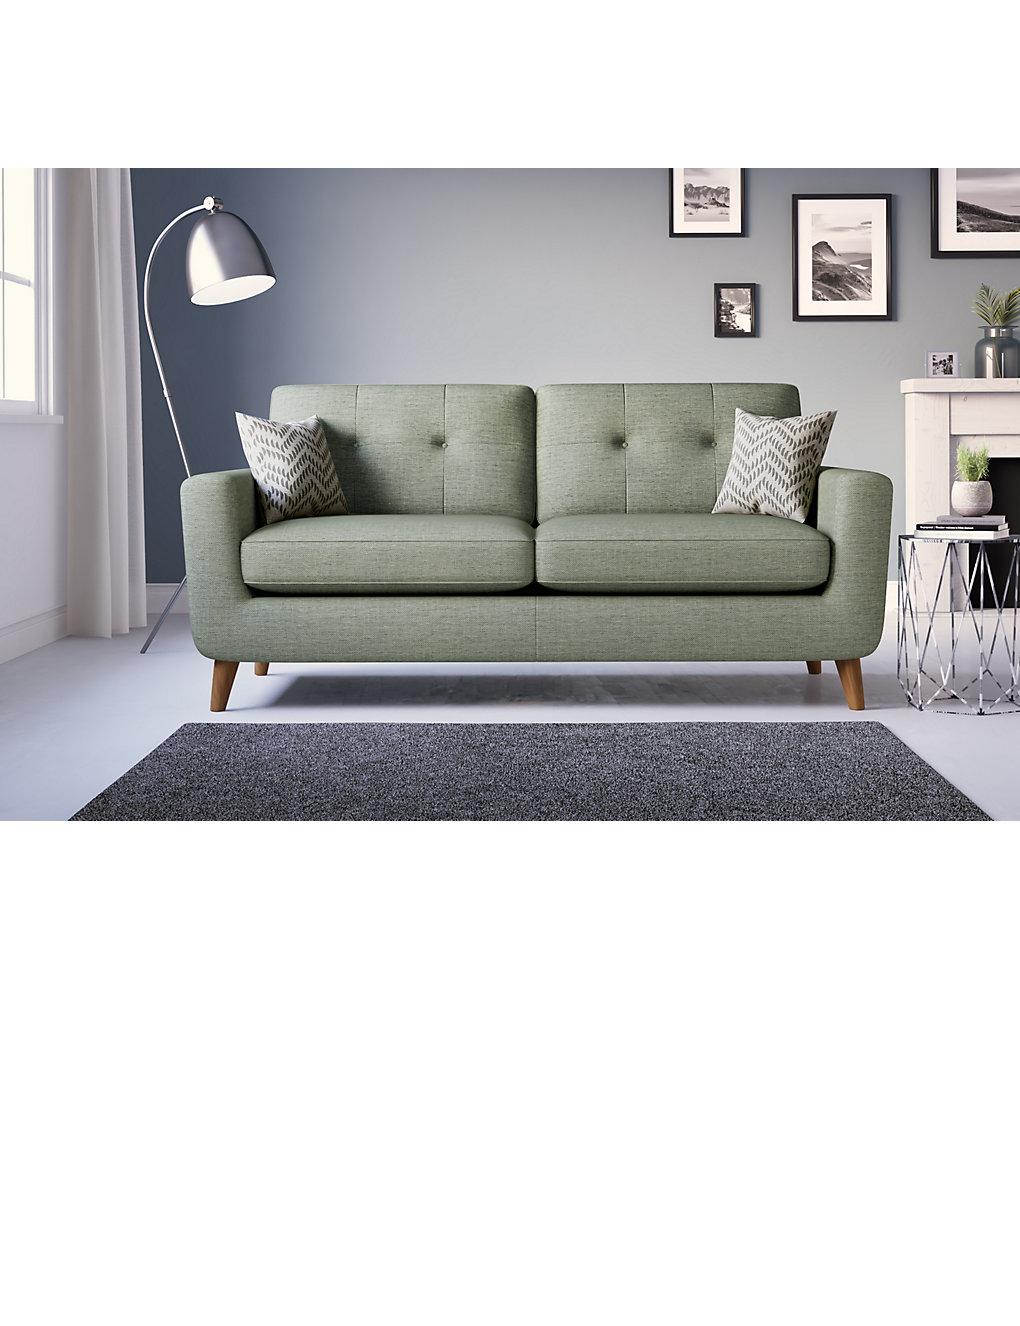 Needham Large Sofa   M&S